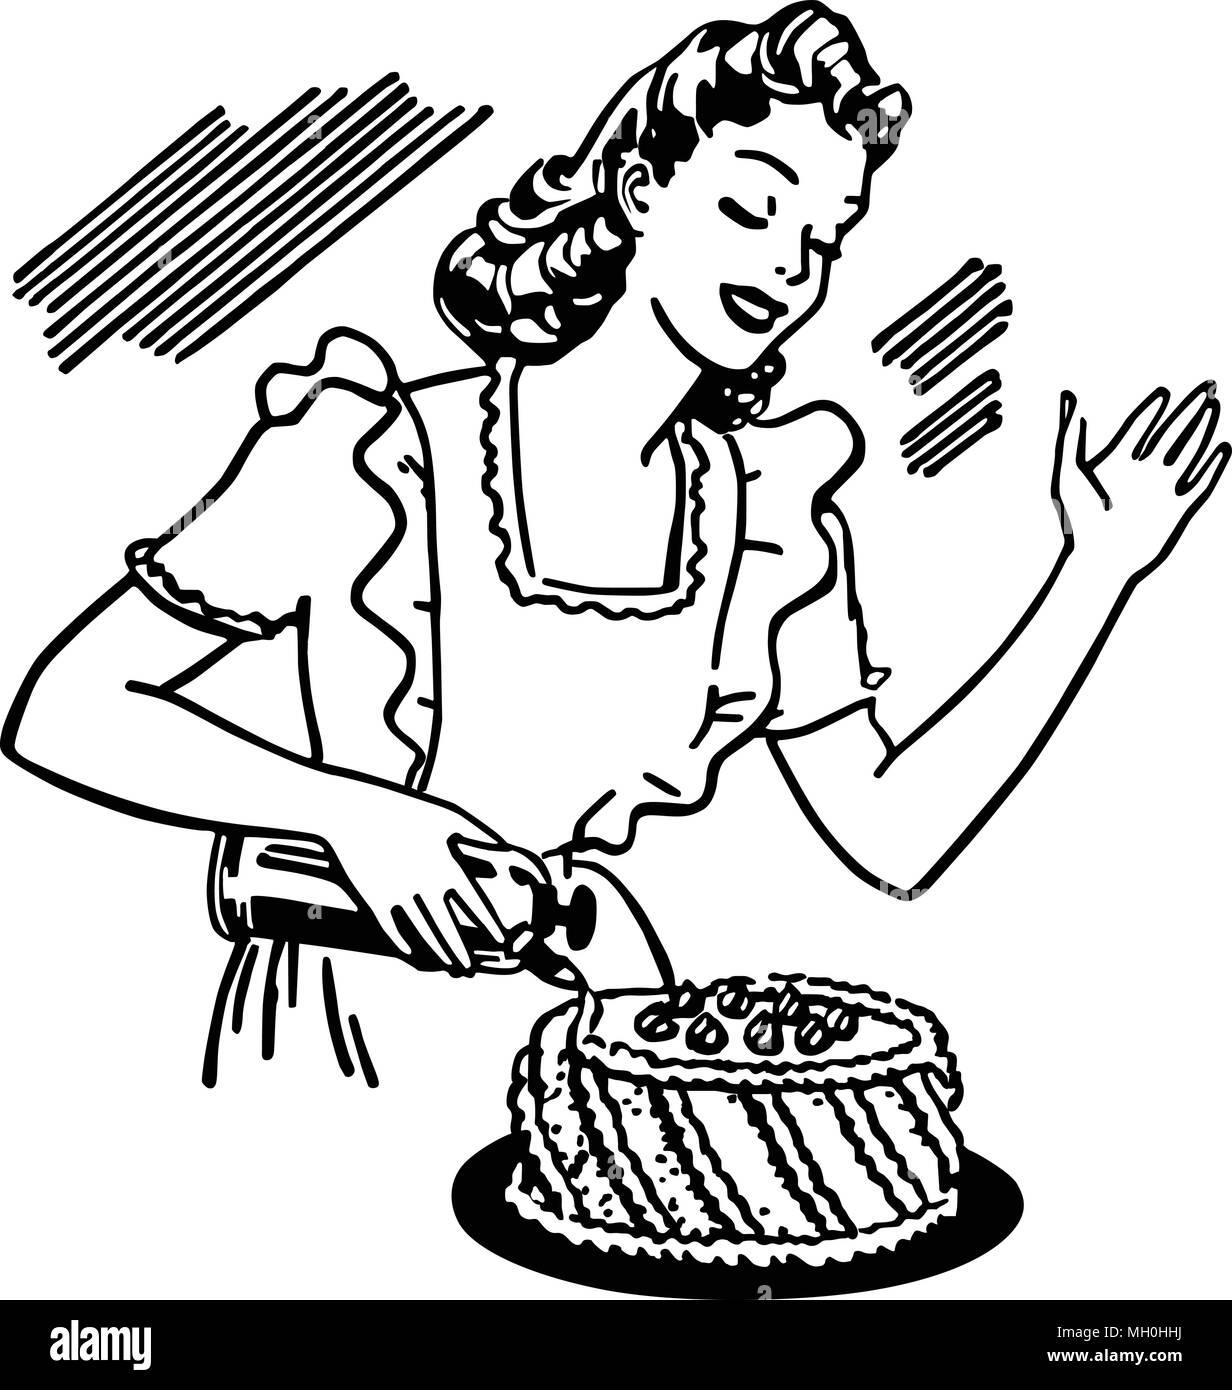 Woman Decorating Cake - Retro Clipart Illustration - Stock Vector